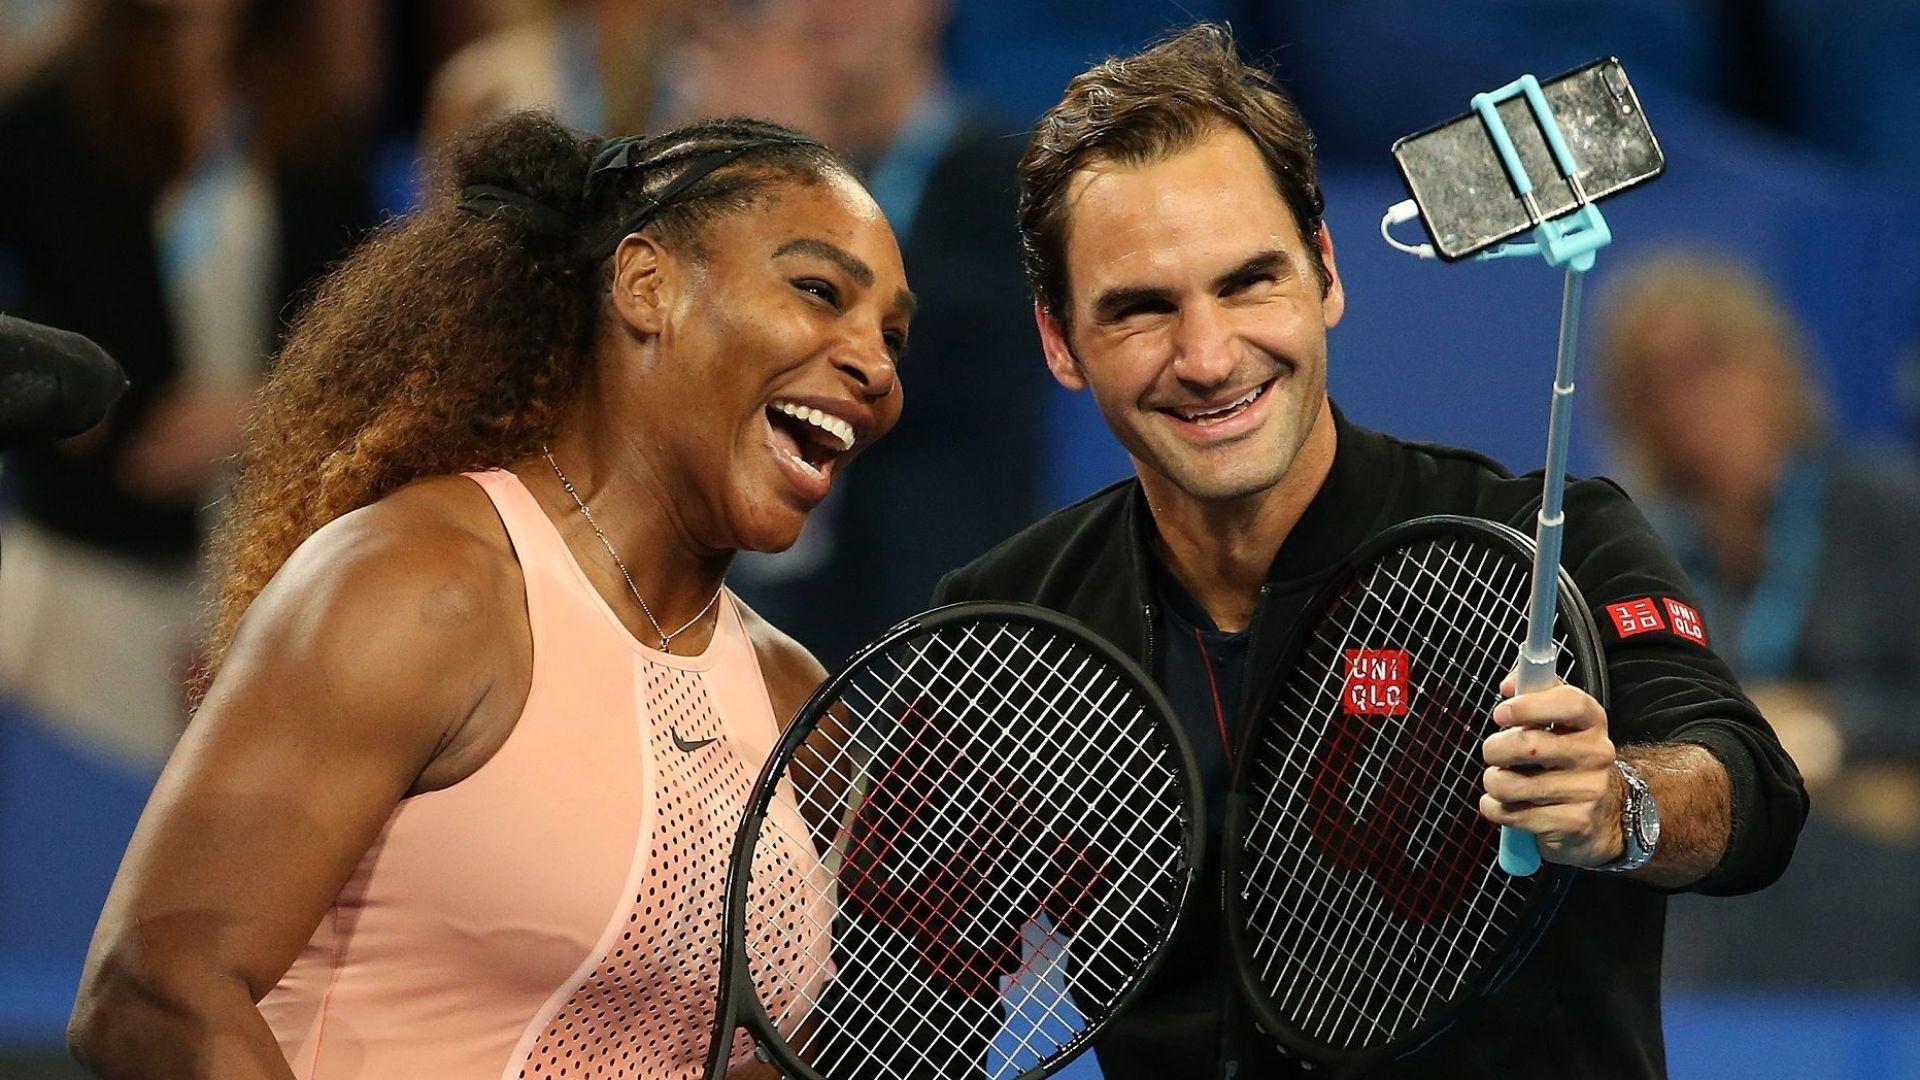 Шоу и швейцарски триумф  в историческия мач между Федерер и Серина